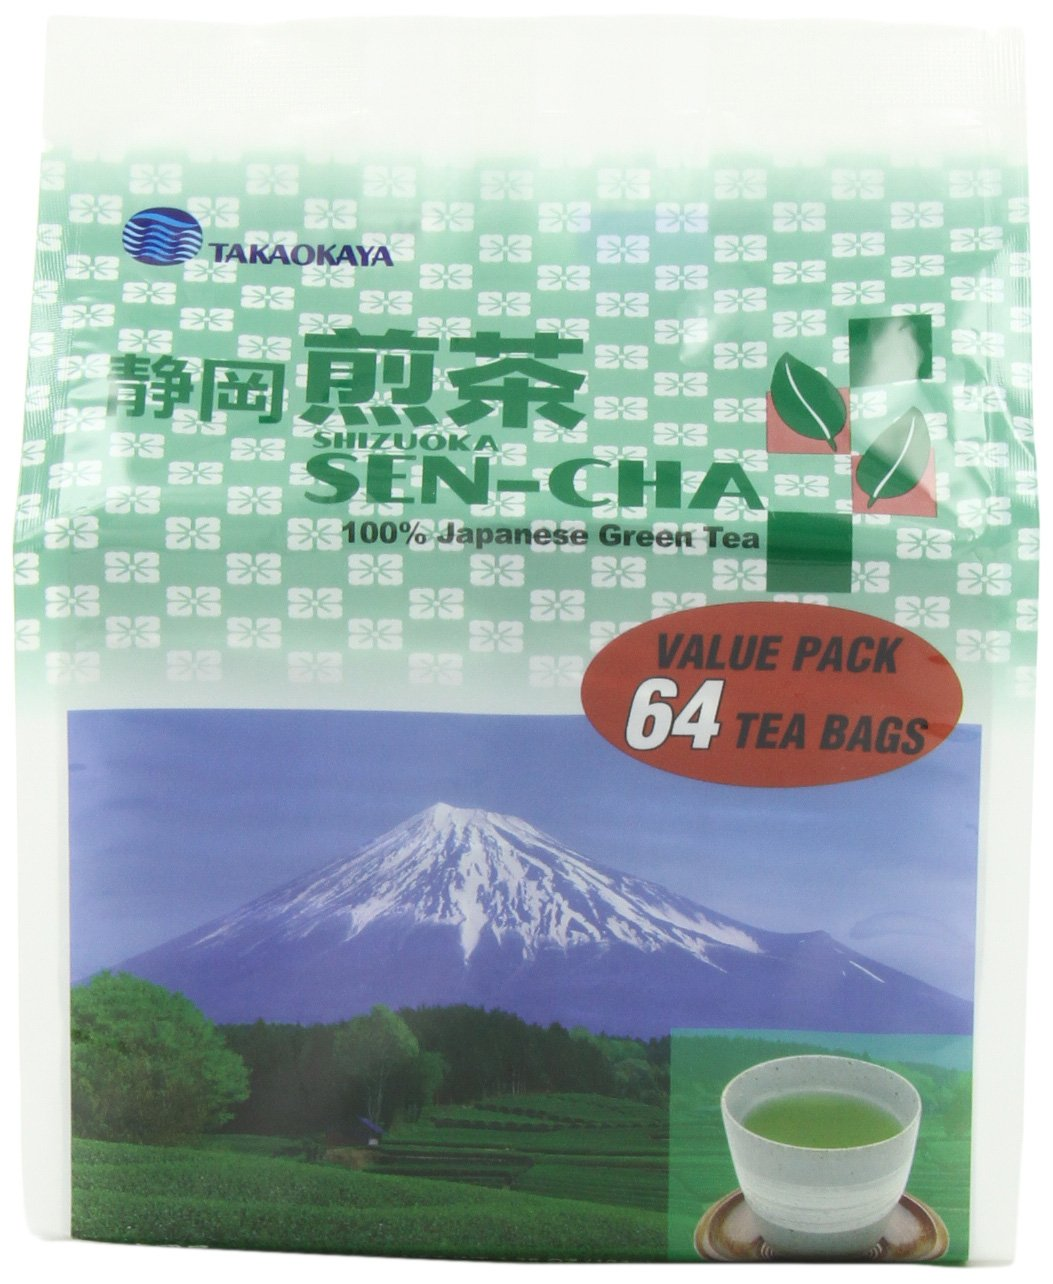 Takaokaya Tea T Green Sencha shipfree TeaBags 4 64-Count Special sale item Pack Units of